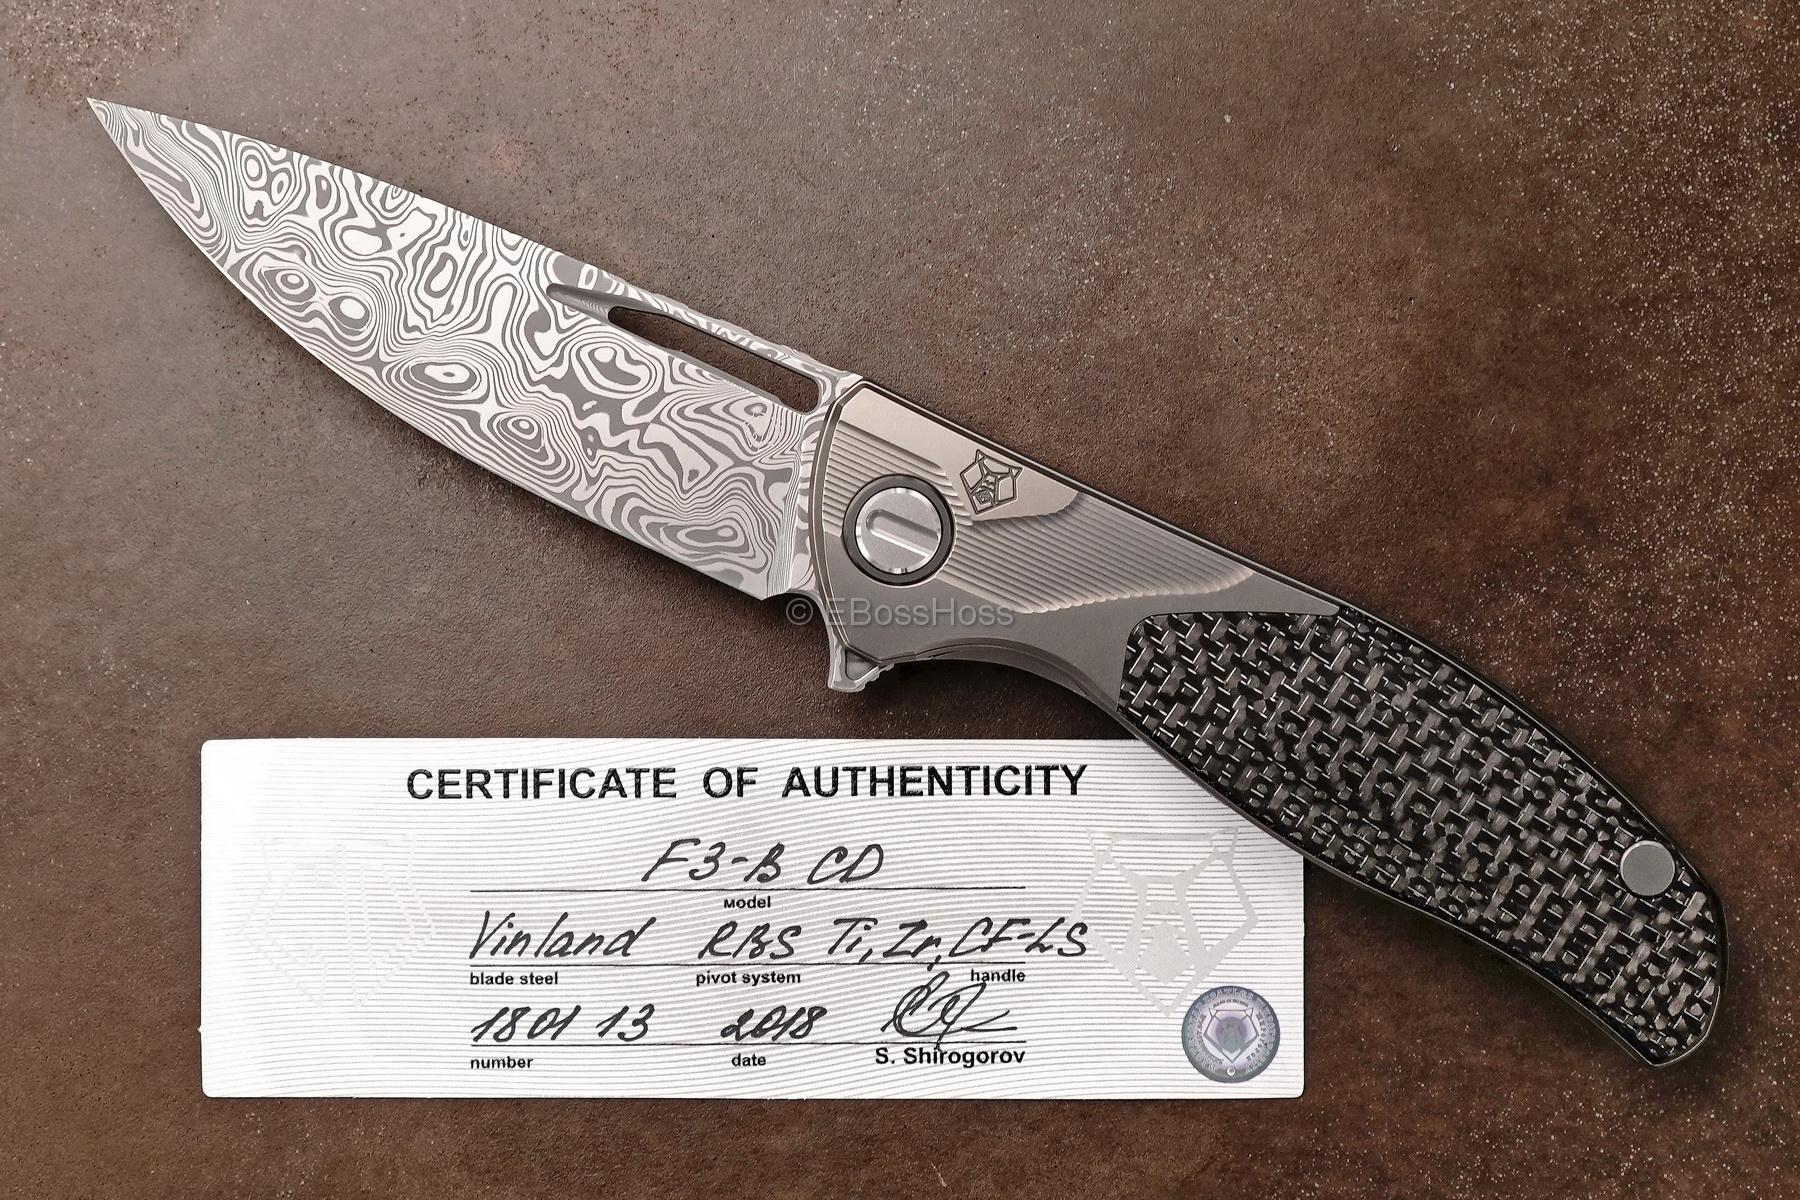 Sergey Shirogorov Custom Division Deluxe F3-B Flipper